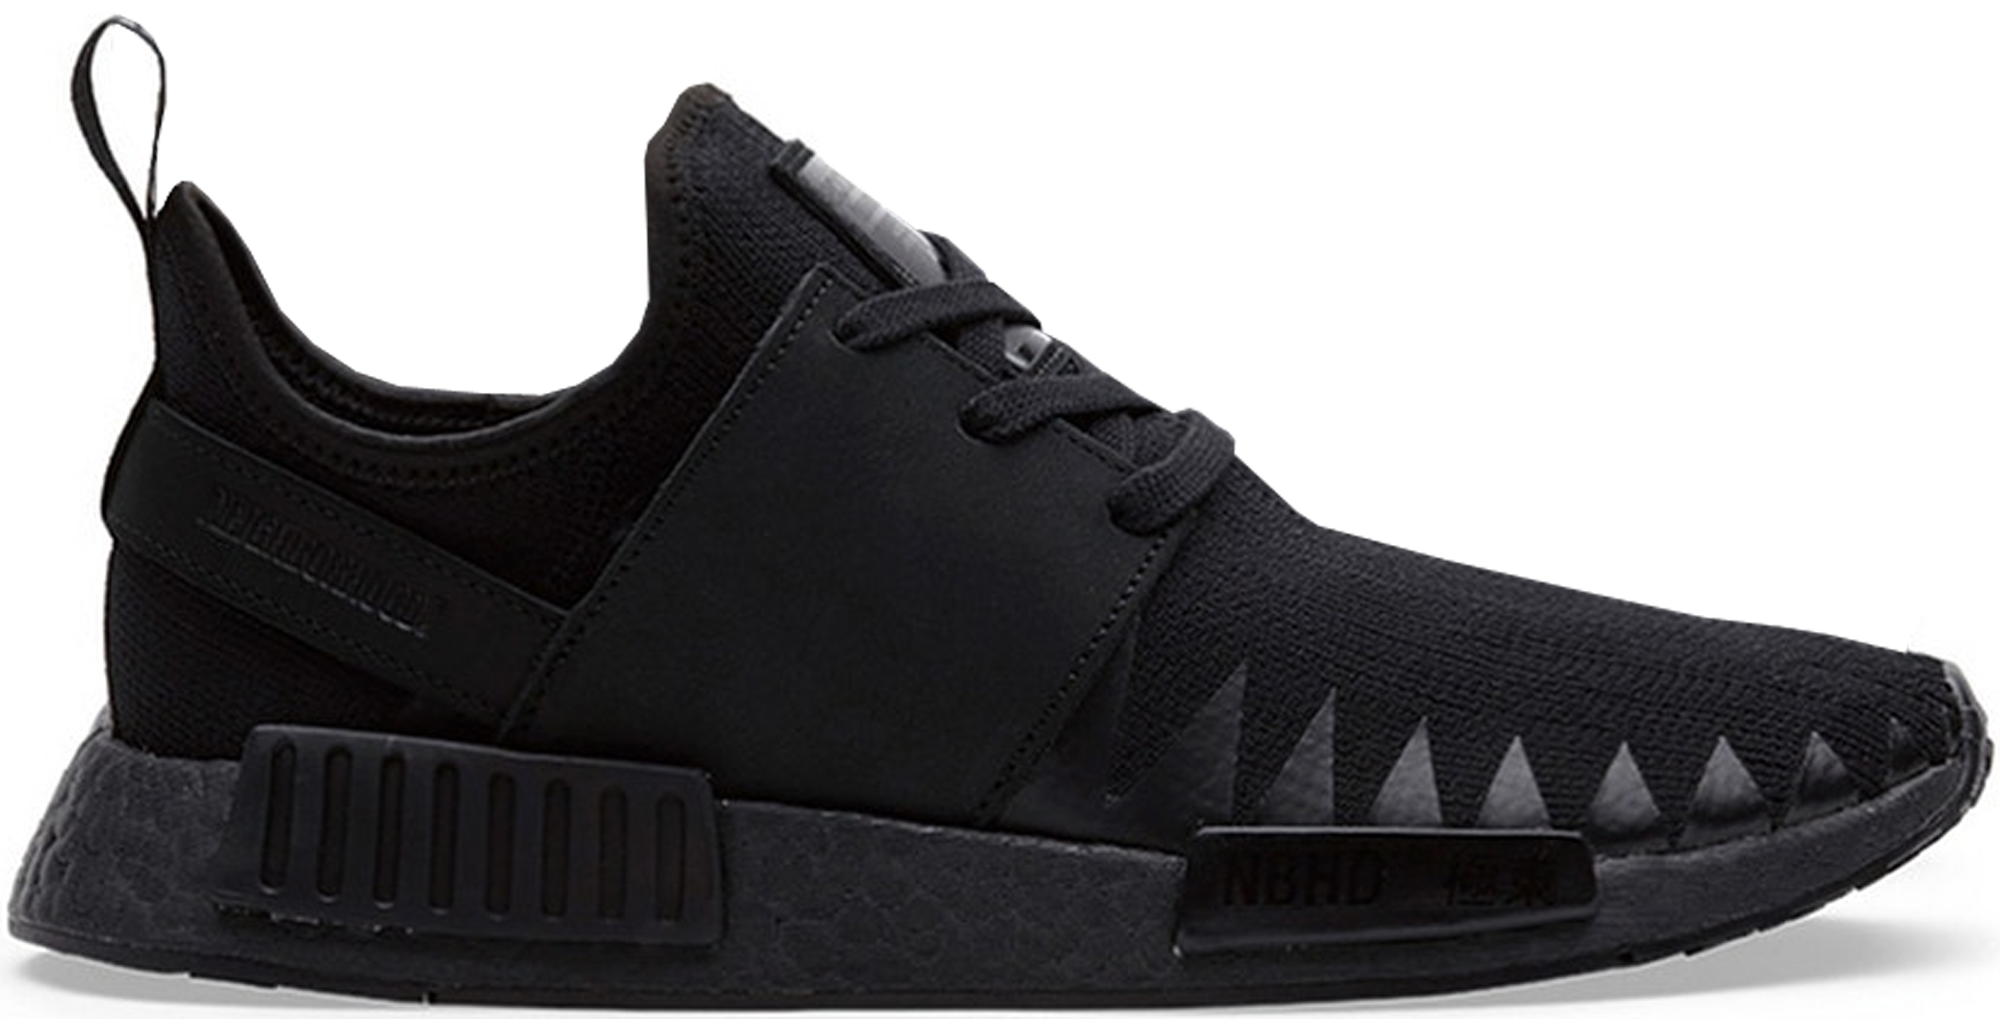 adidas NMD R1 Neighborhood Triple Black